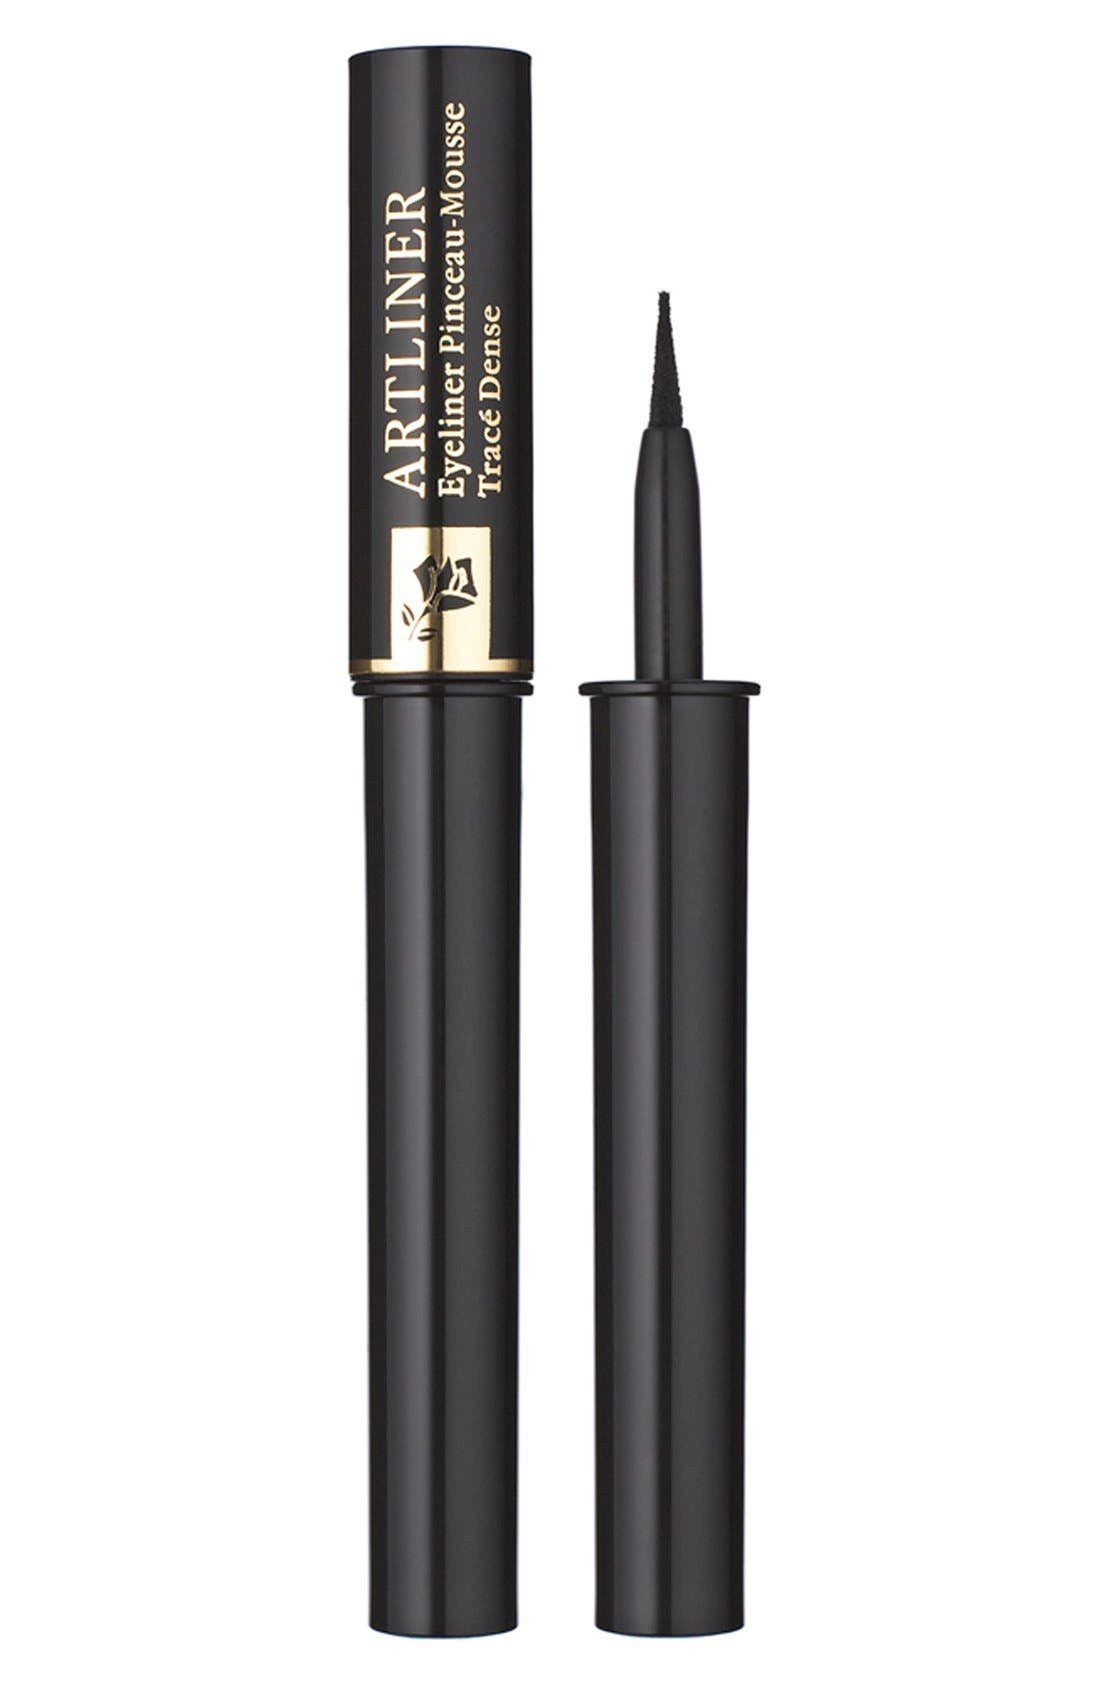 Lancome Artliner Precision Point Liquid Eyeliner - Noir